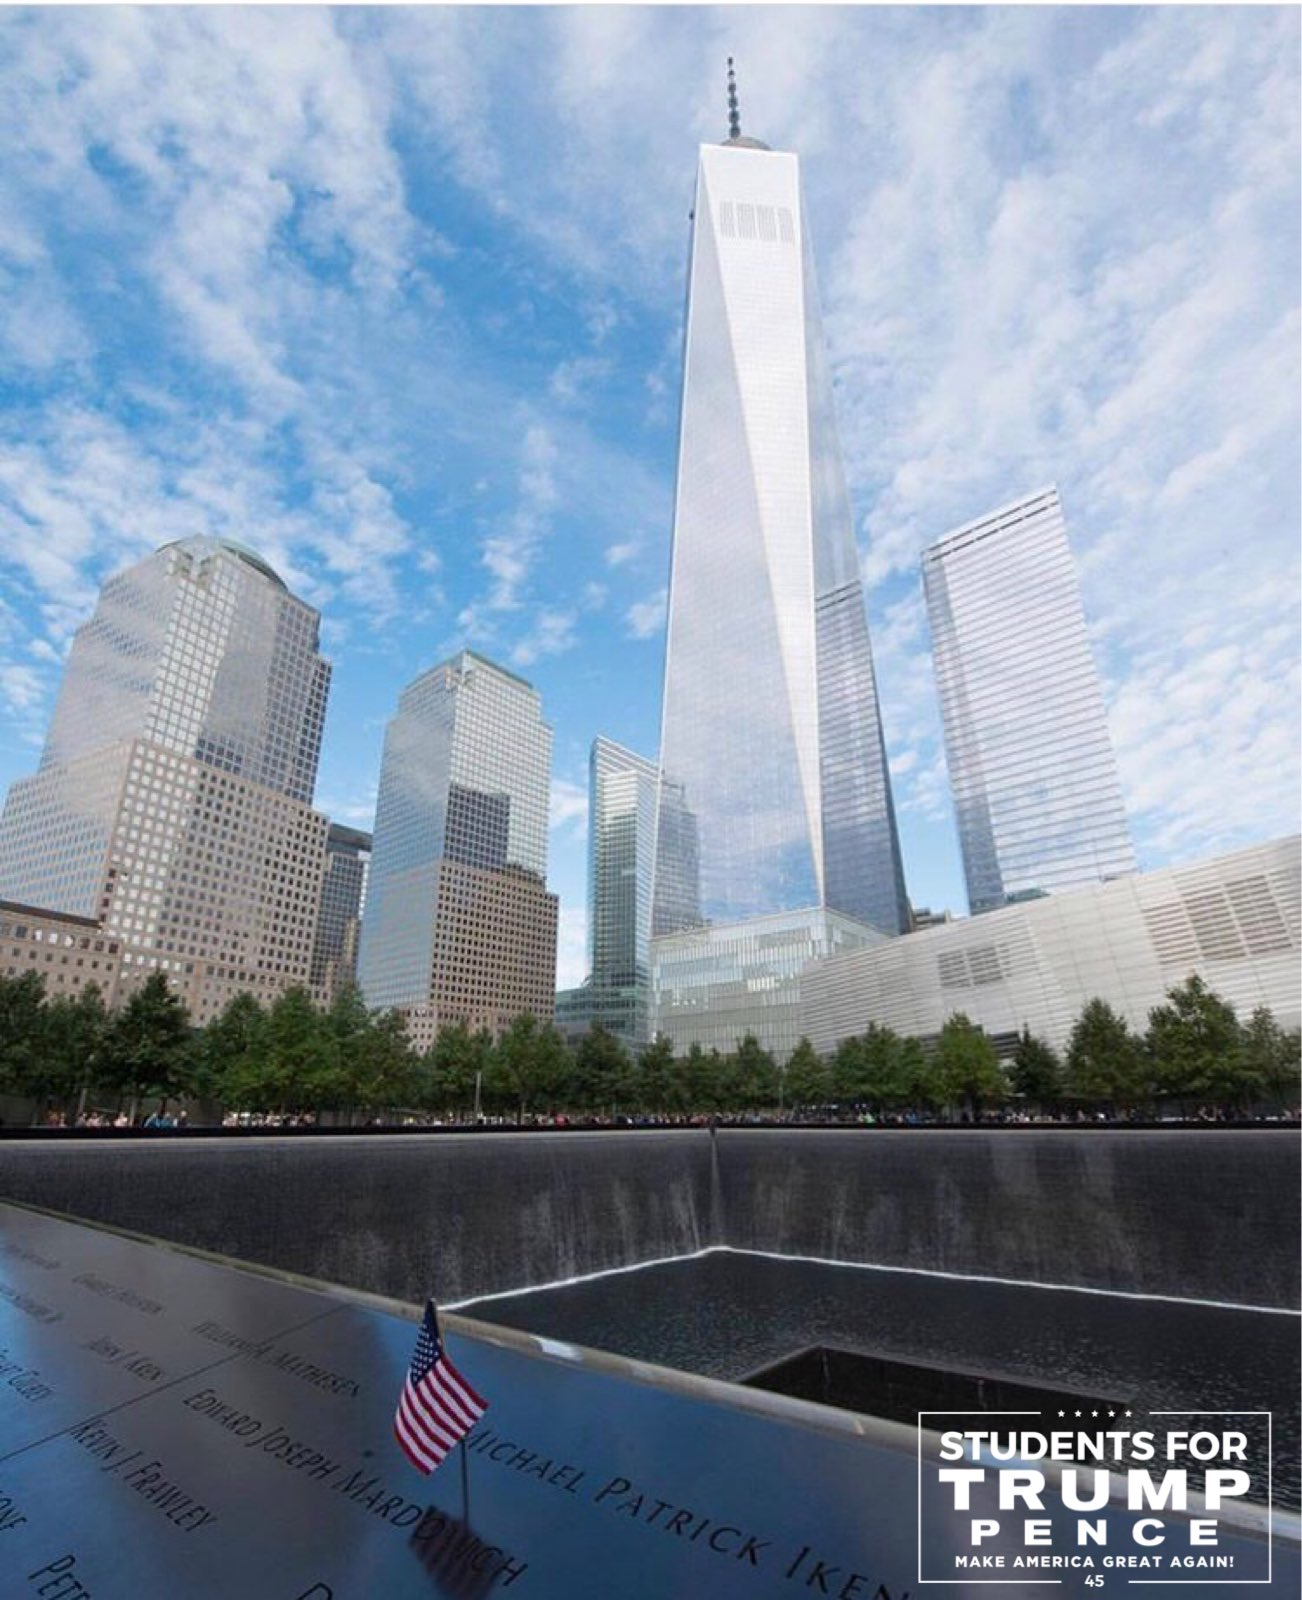 Never Forget. ���� #AmericaStrong https://t.co/9VbwajGeqs